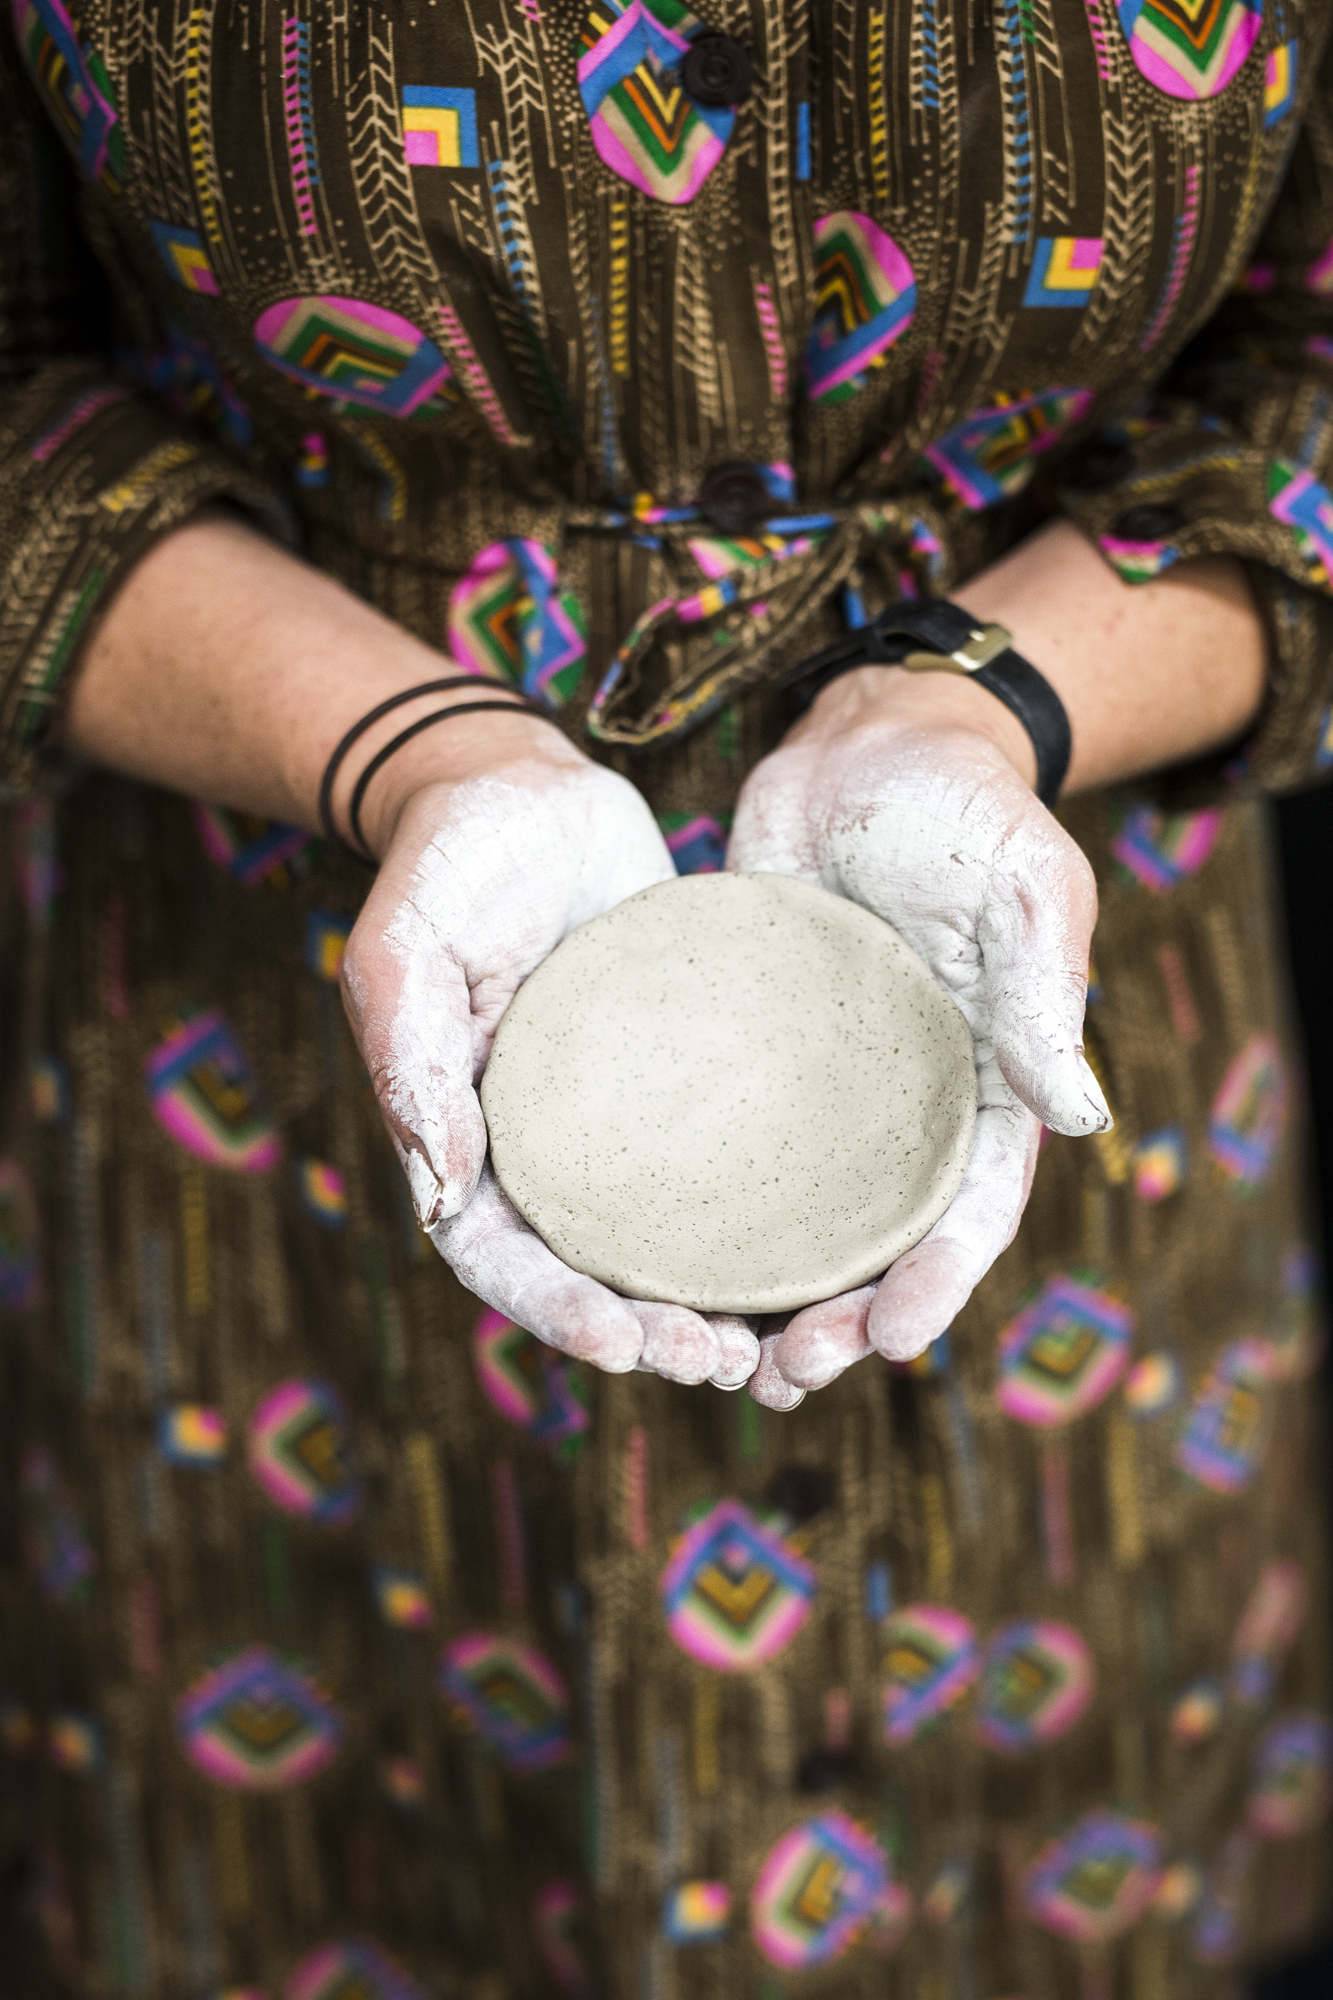 Ceramics - PYHII_79.JPG